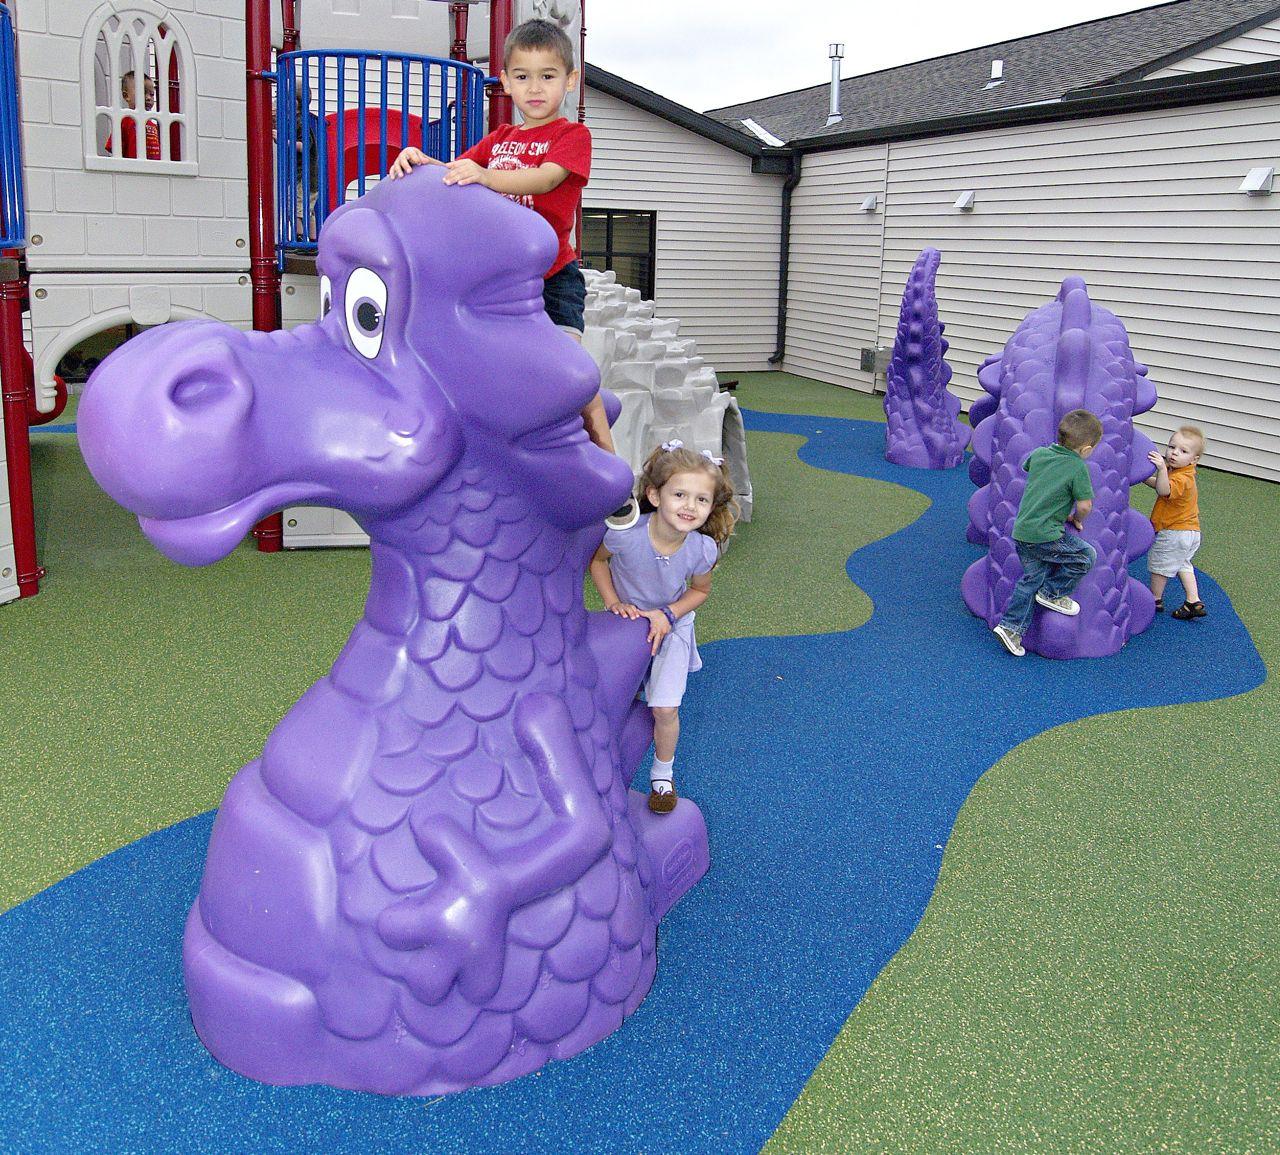 Dragon Challenge Little Tikes Outdoor Playground Structure